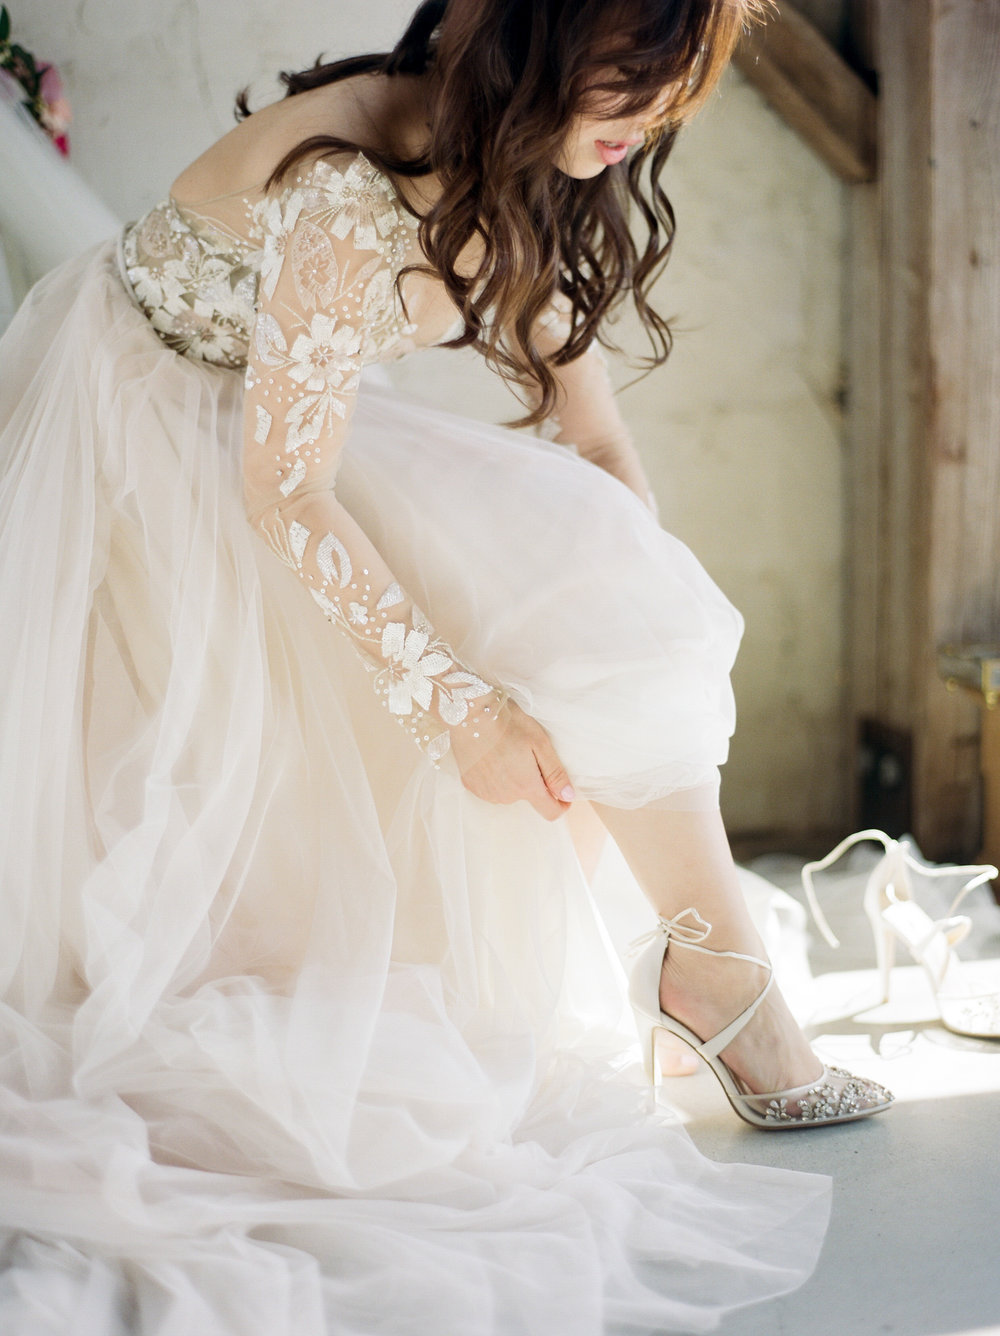 The-Knot-50-Weddings-50-States-Texas-Winner-Dana-Fernandez-photography-houston-wedding-photographer-film-fine-art-destination-8.jpg